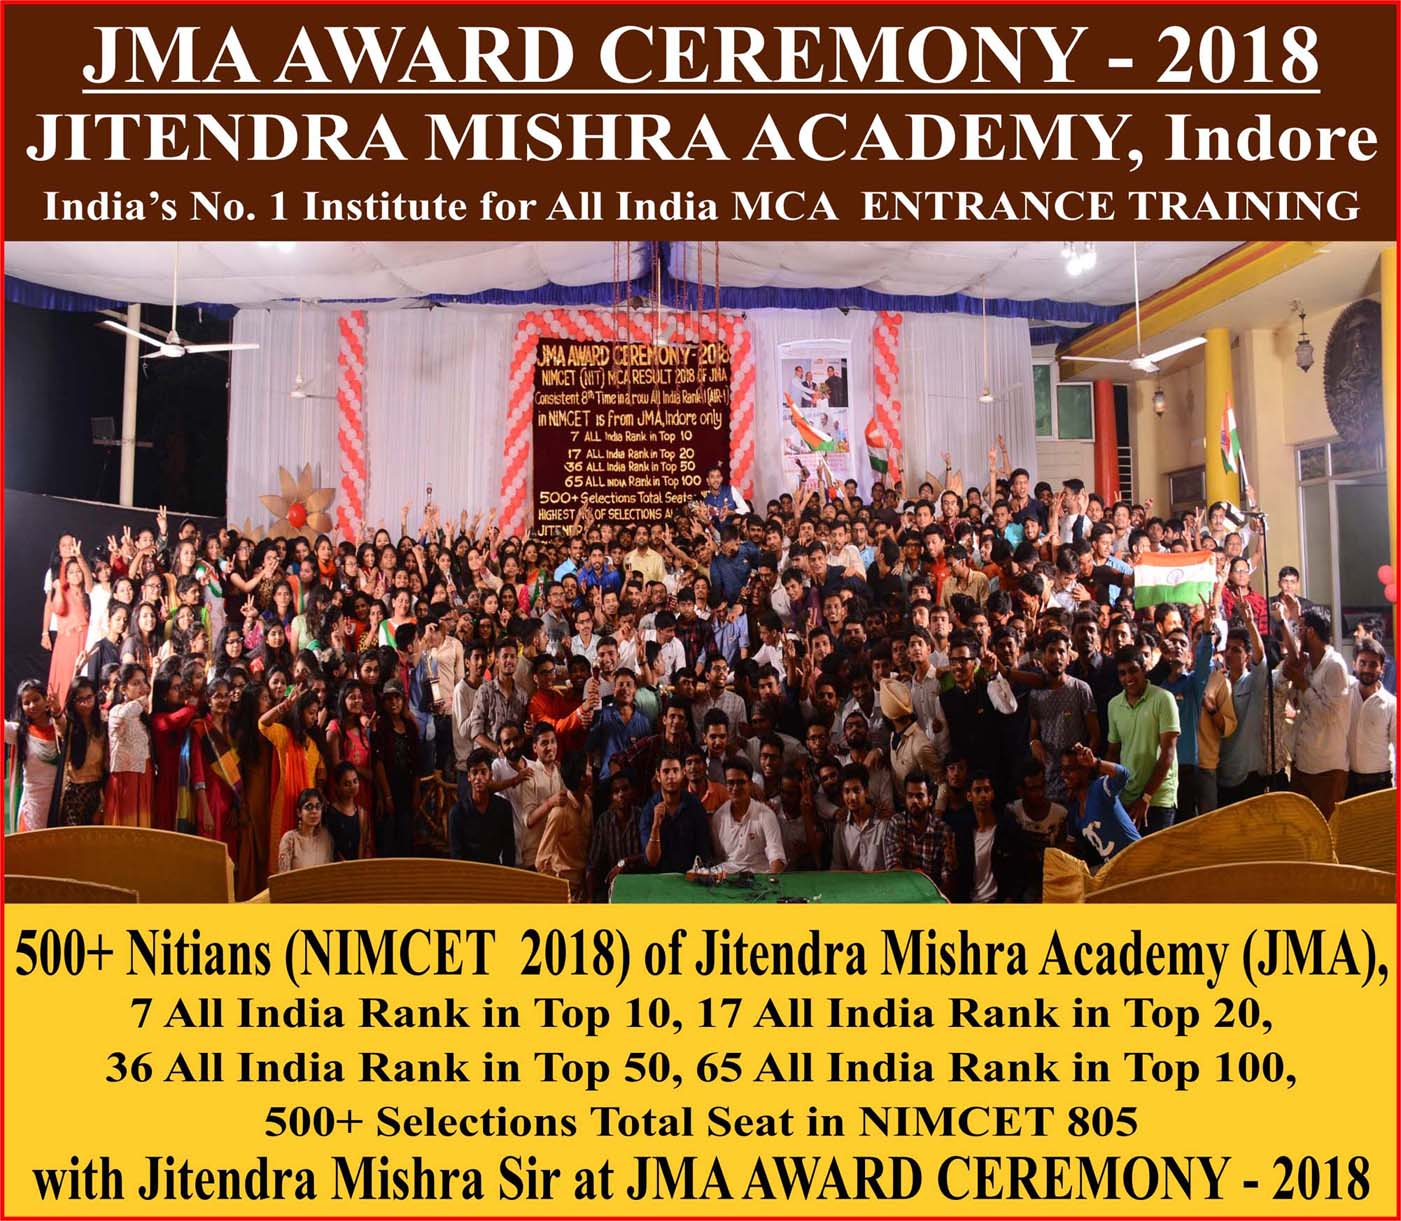 NIMCET 2018 students